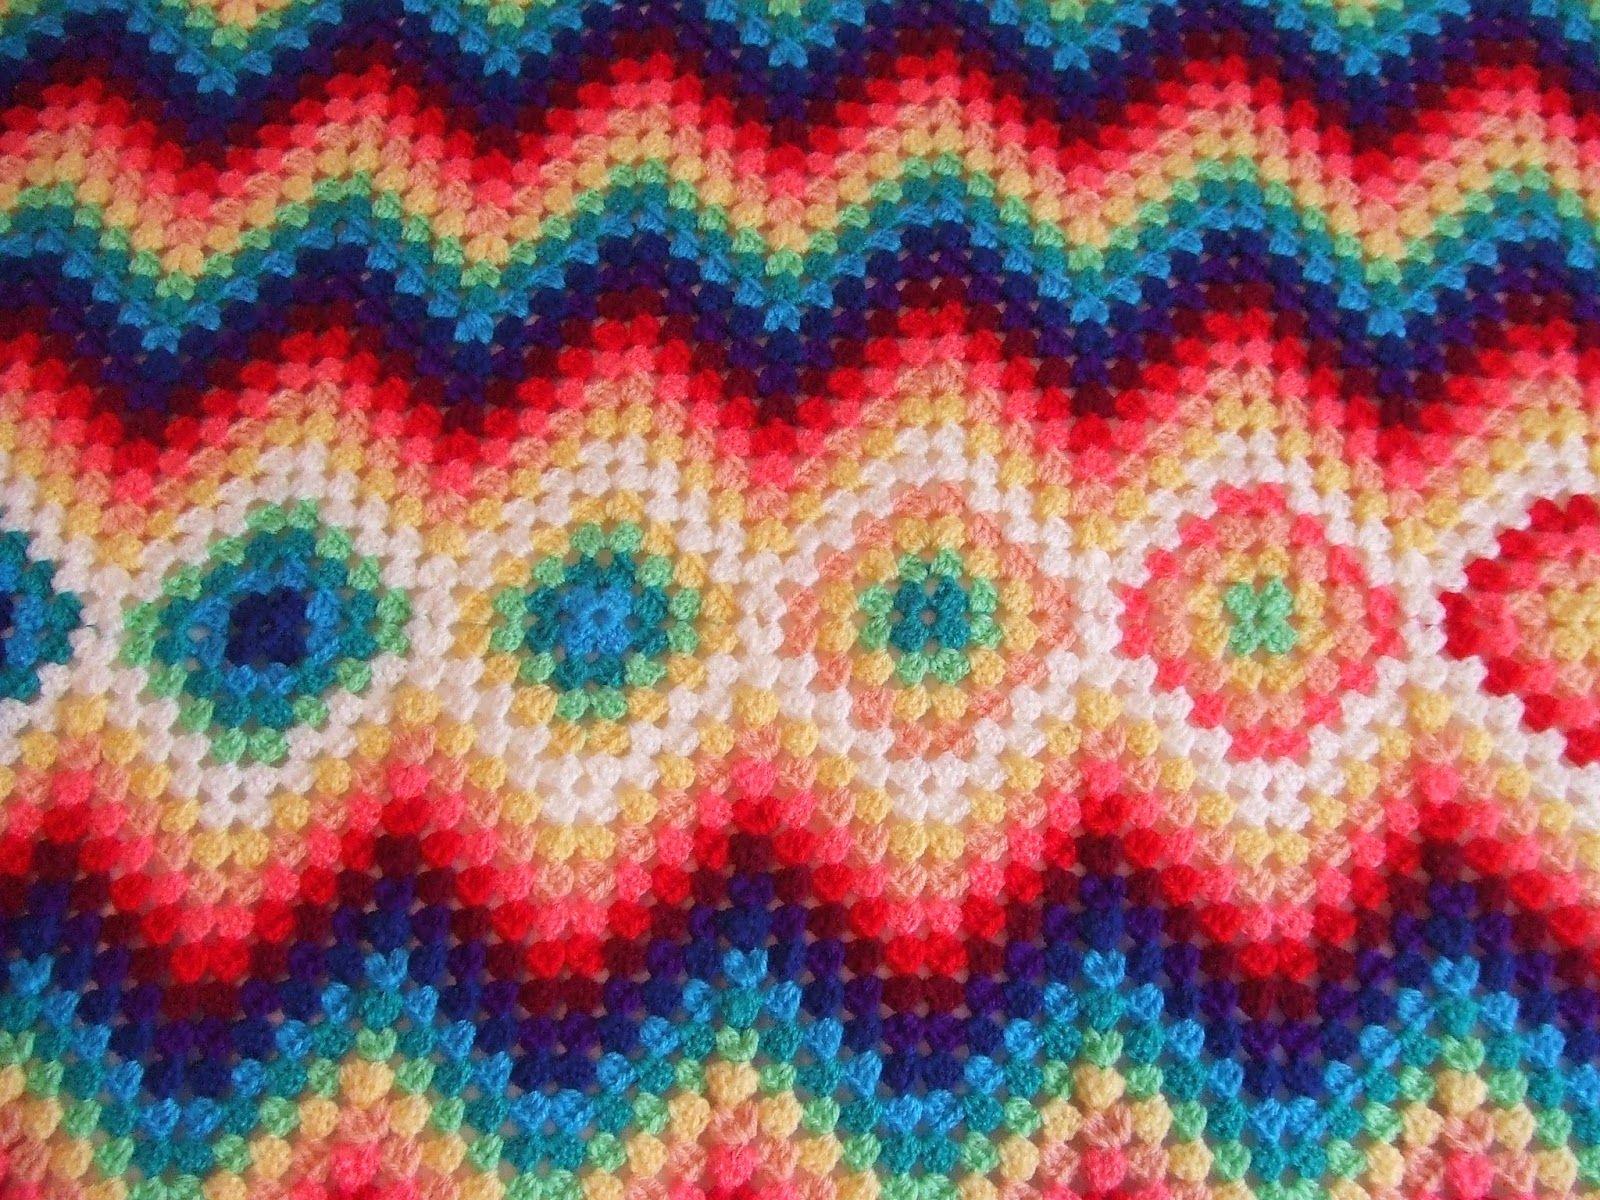 Old Fashioned Ripple Häkeln Afghan Muster Festooning - Decke ...